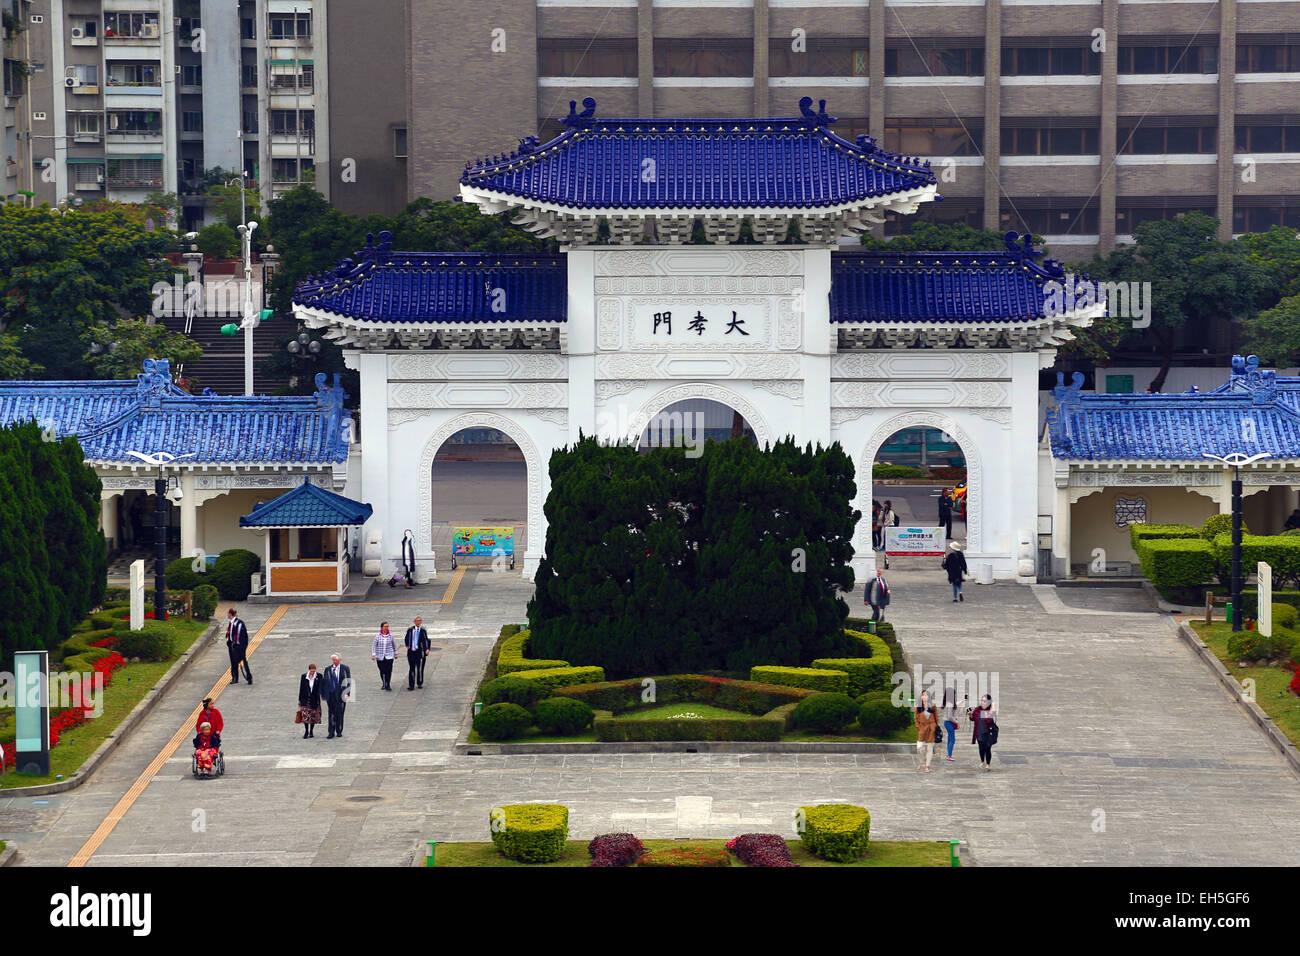 The Gate of Great Piety at the Chiang Kai-shek Memorial Hall, Taipei, Taiwan Stock Photo